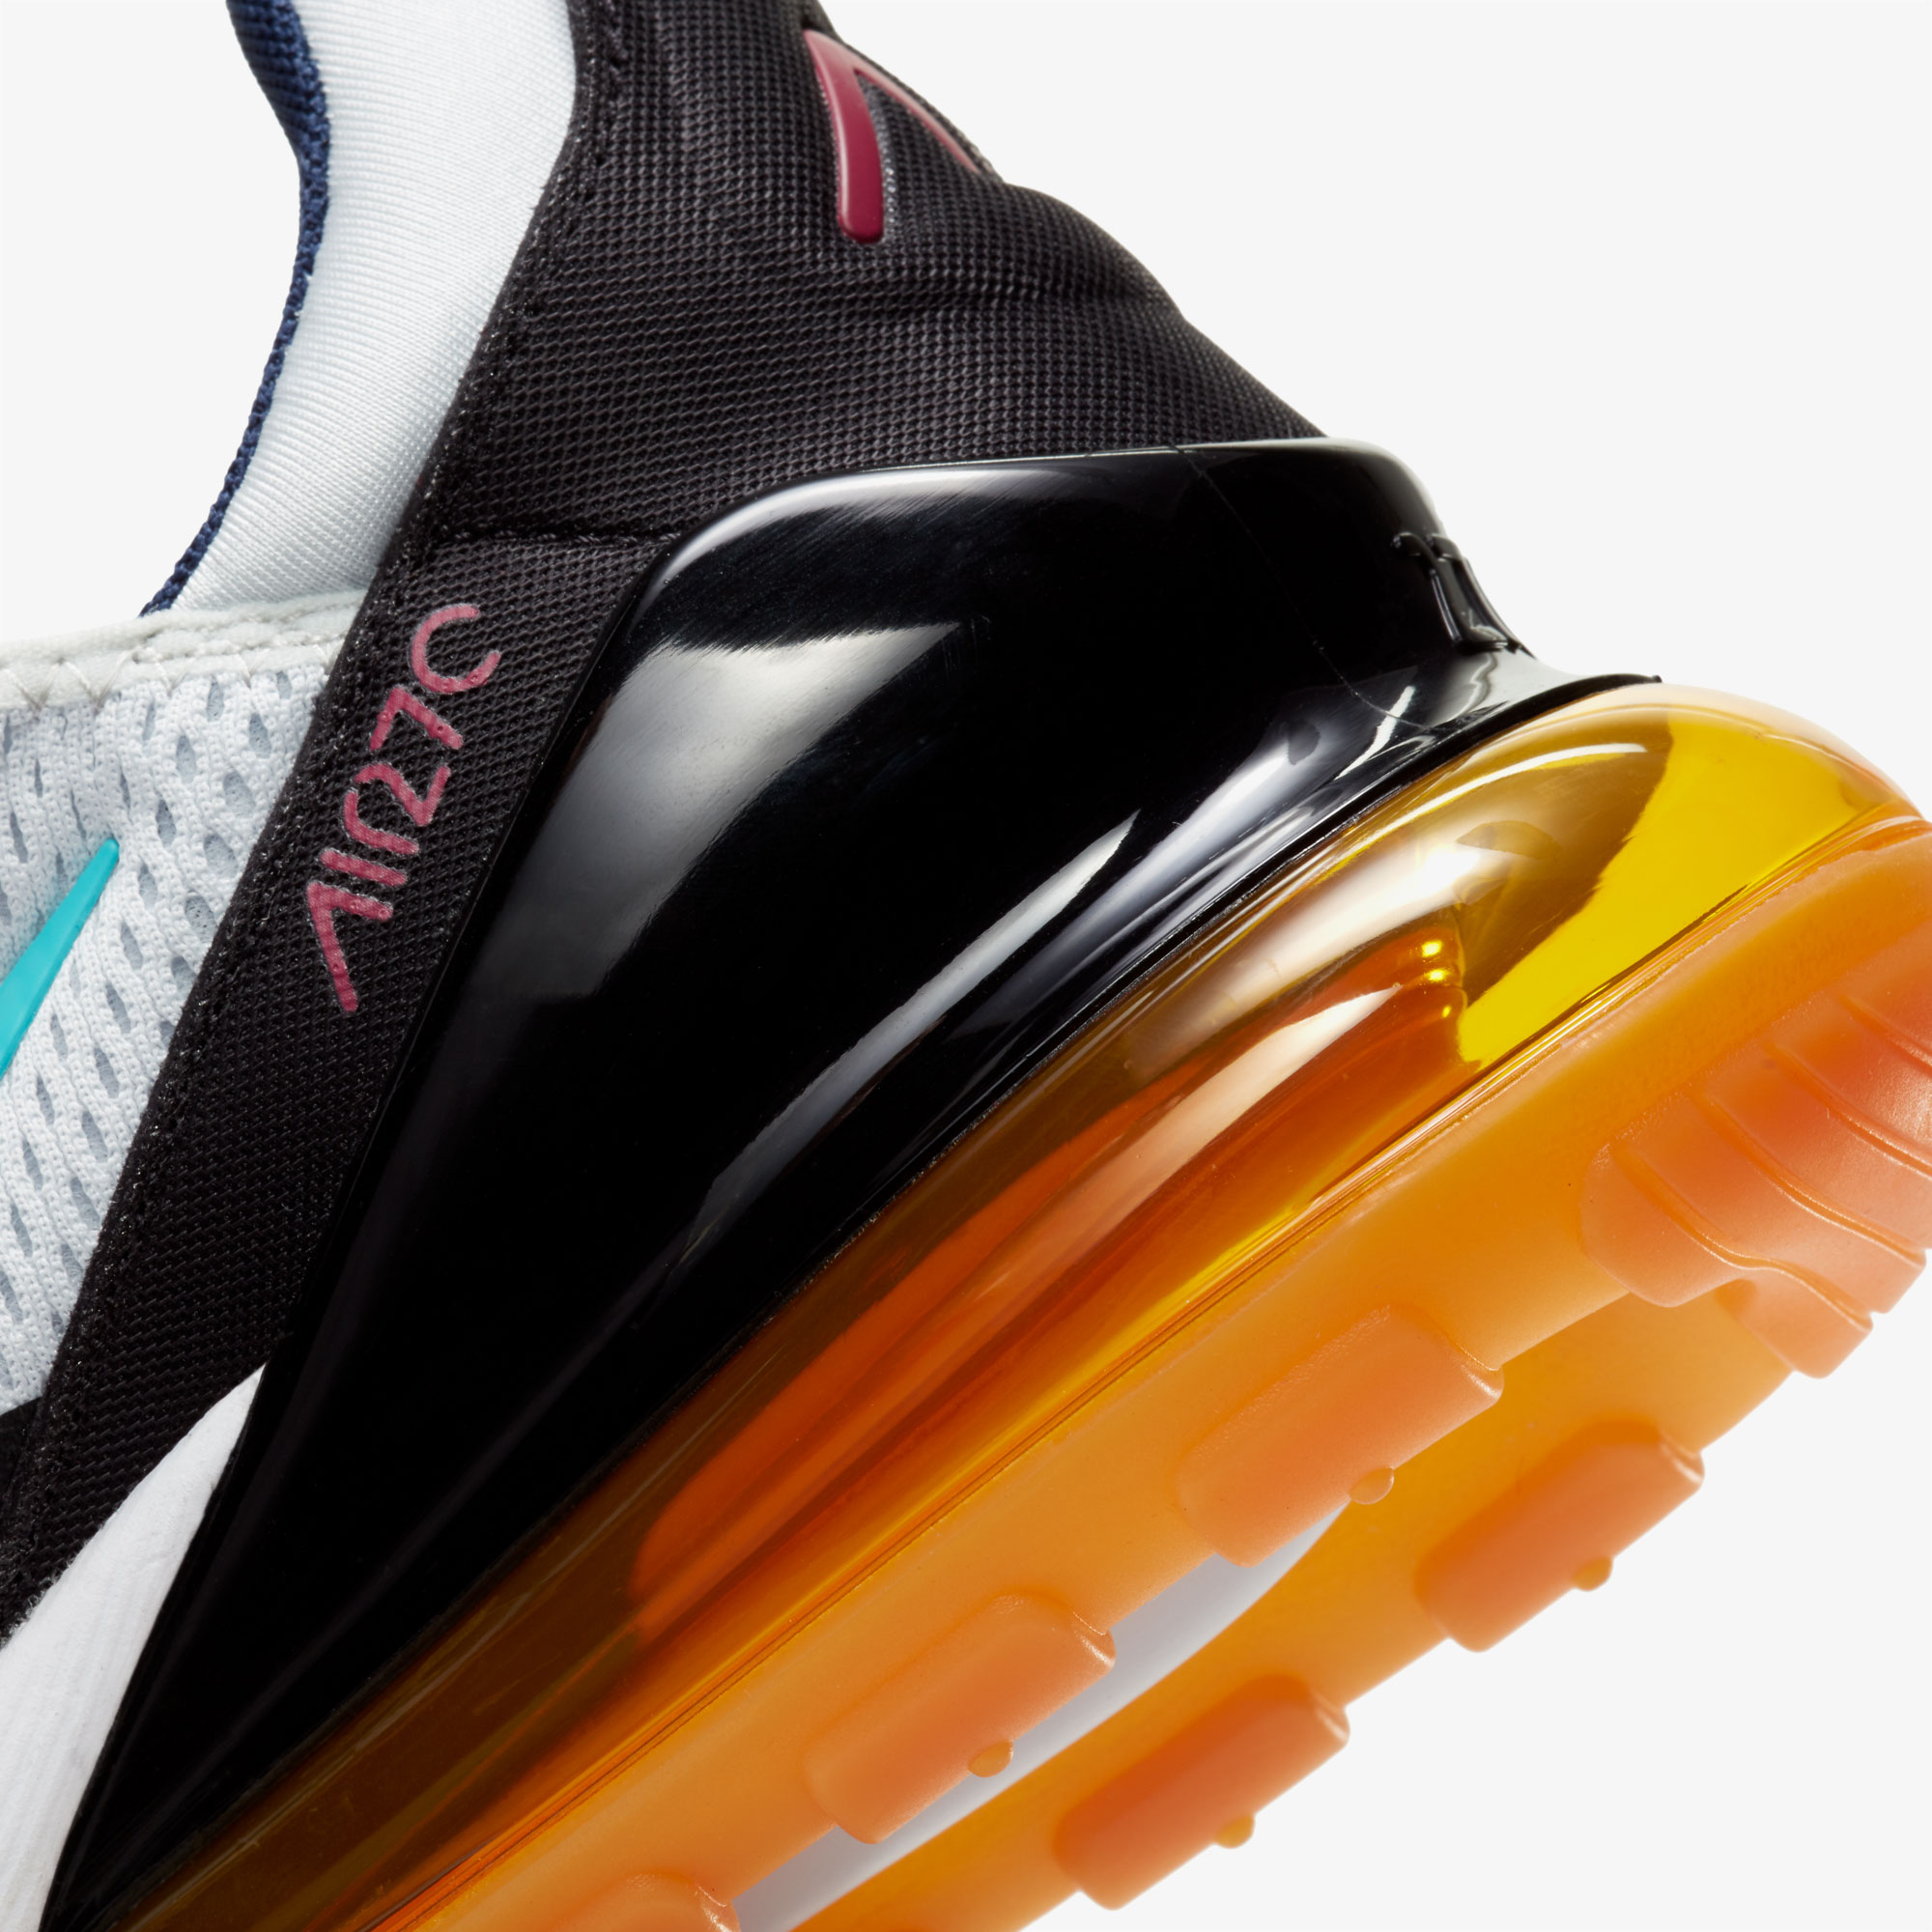 Nike Air Max 270 Erkek Renkli Spor Ayakkabı